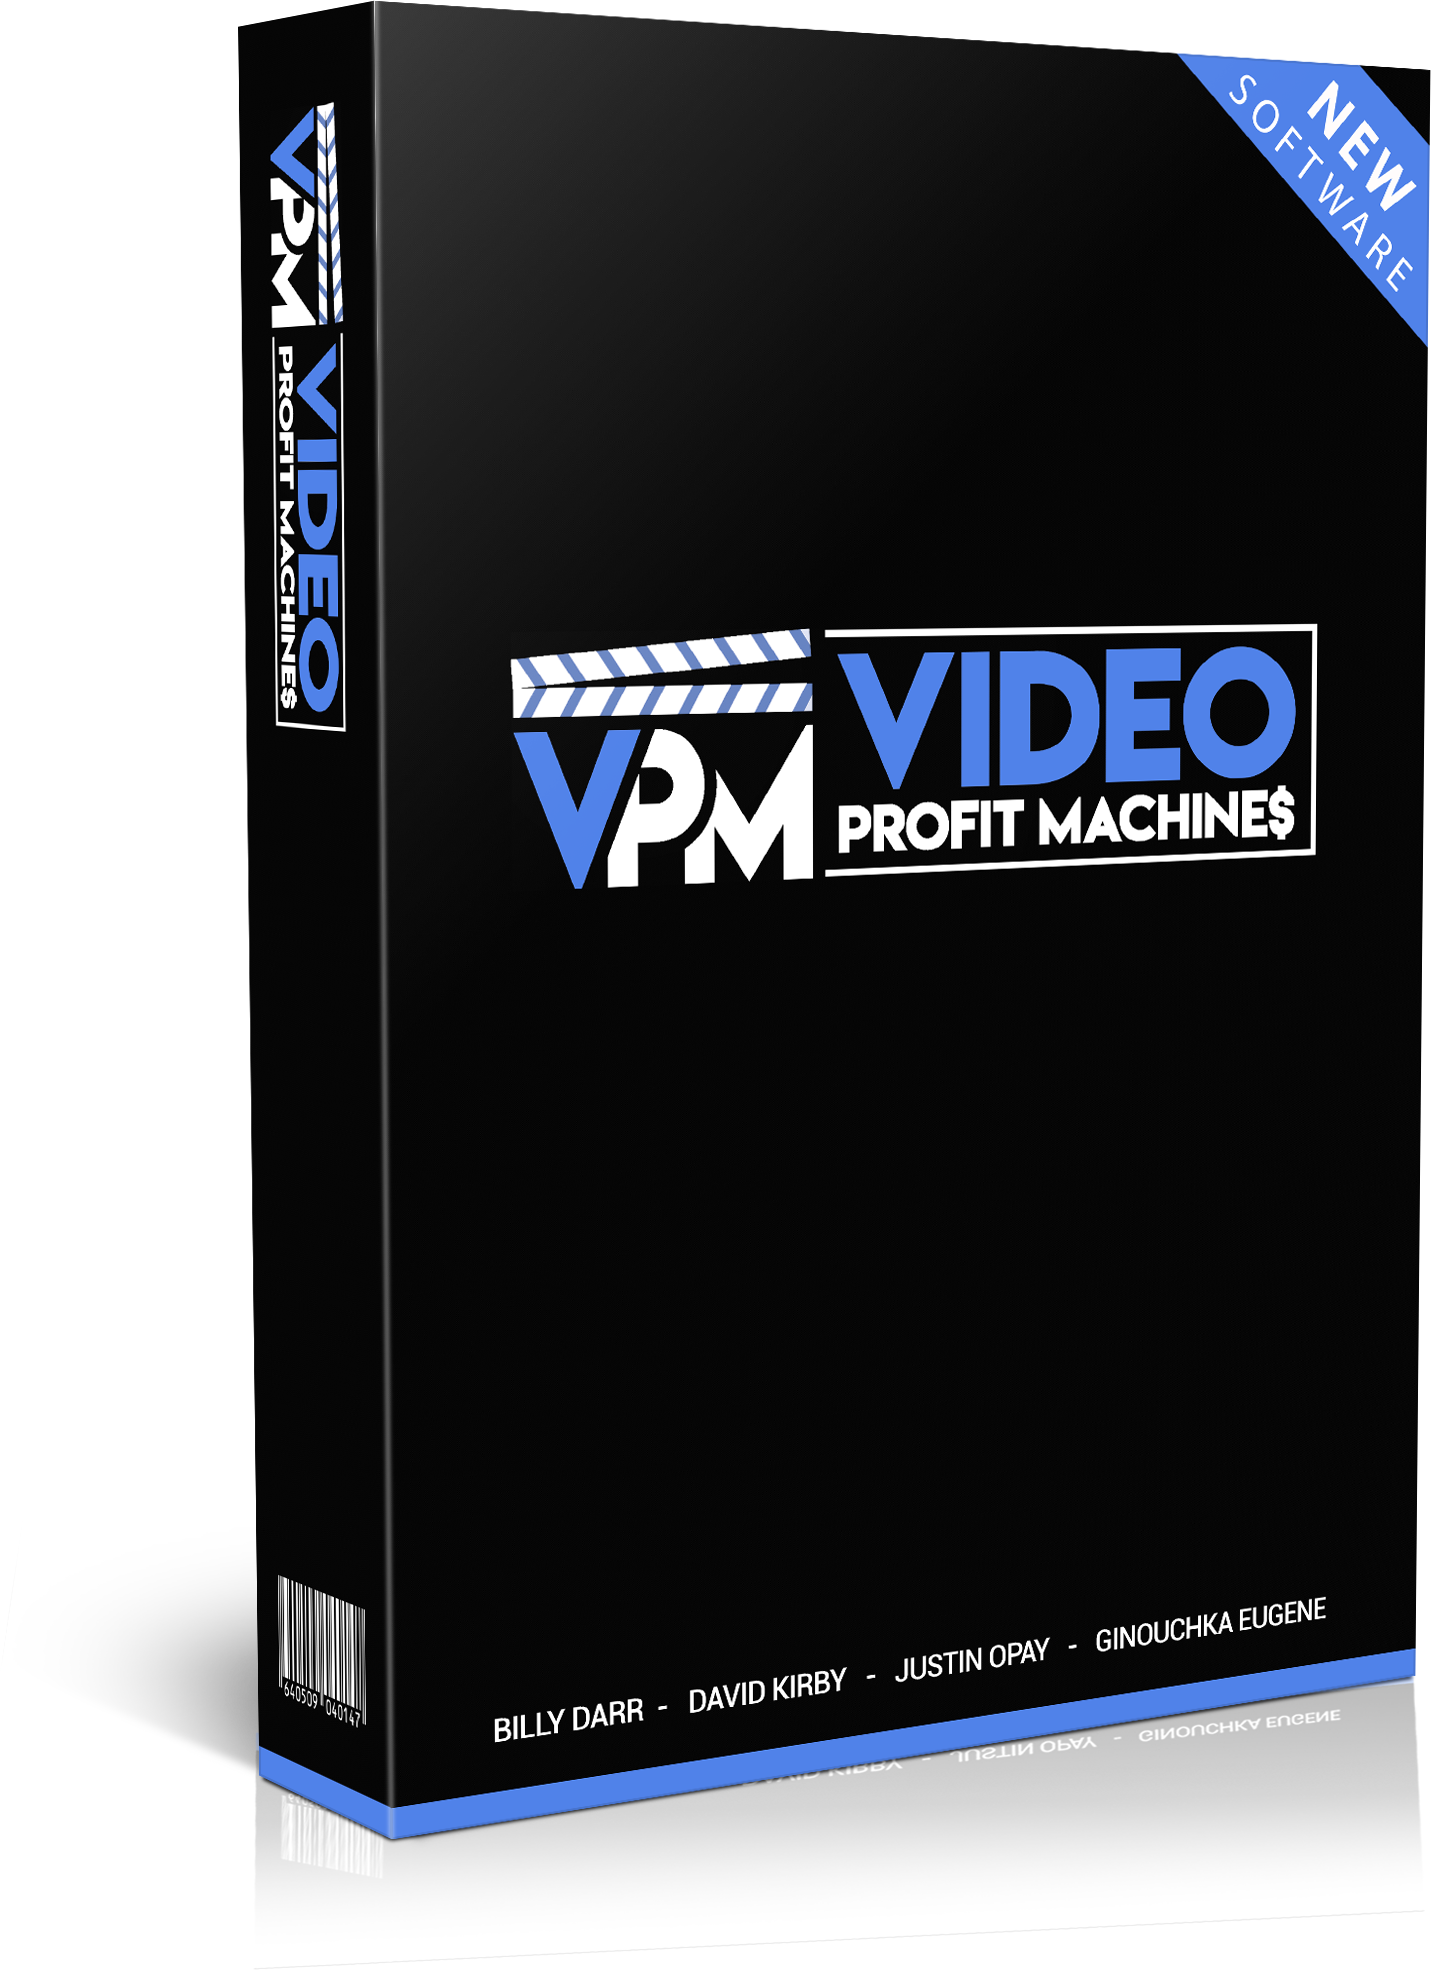 Video Profit Machines Download